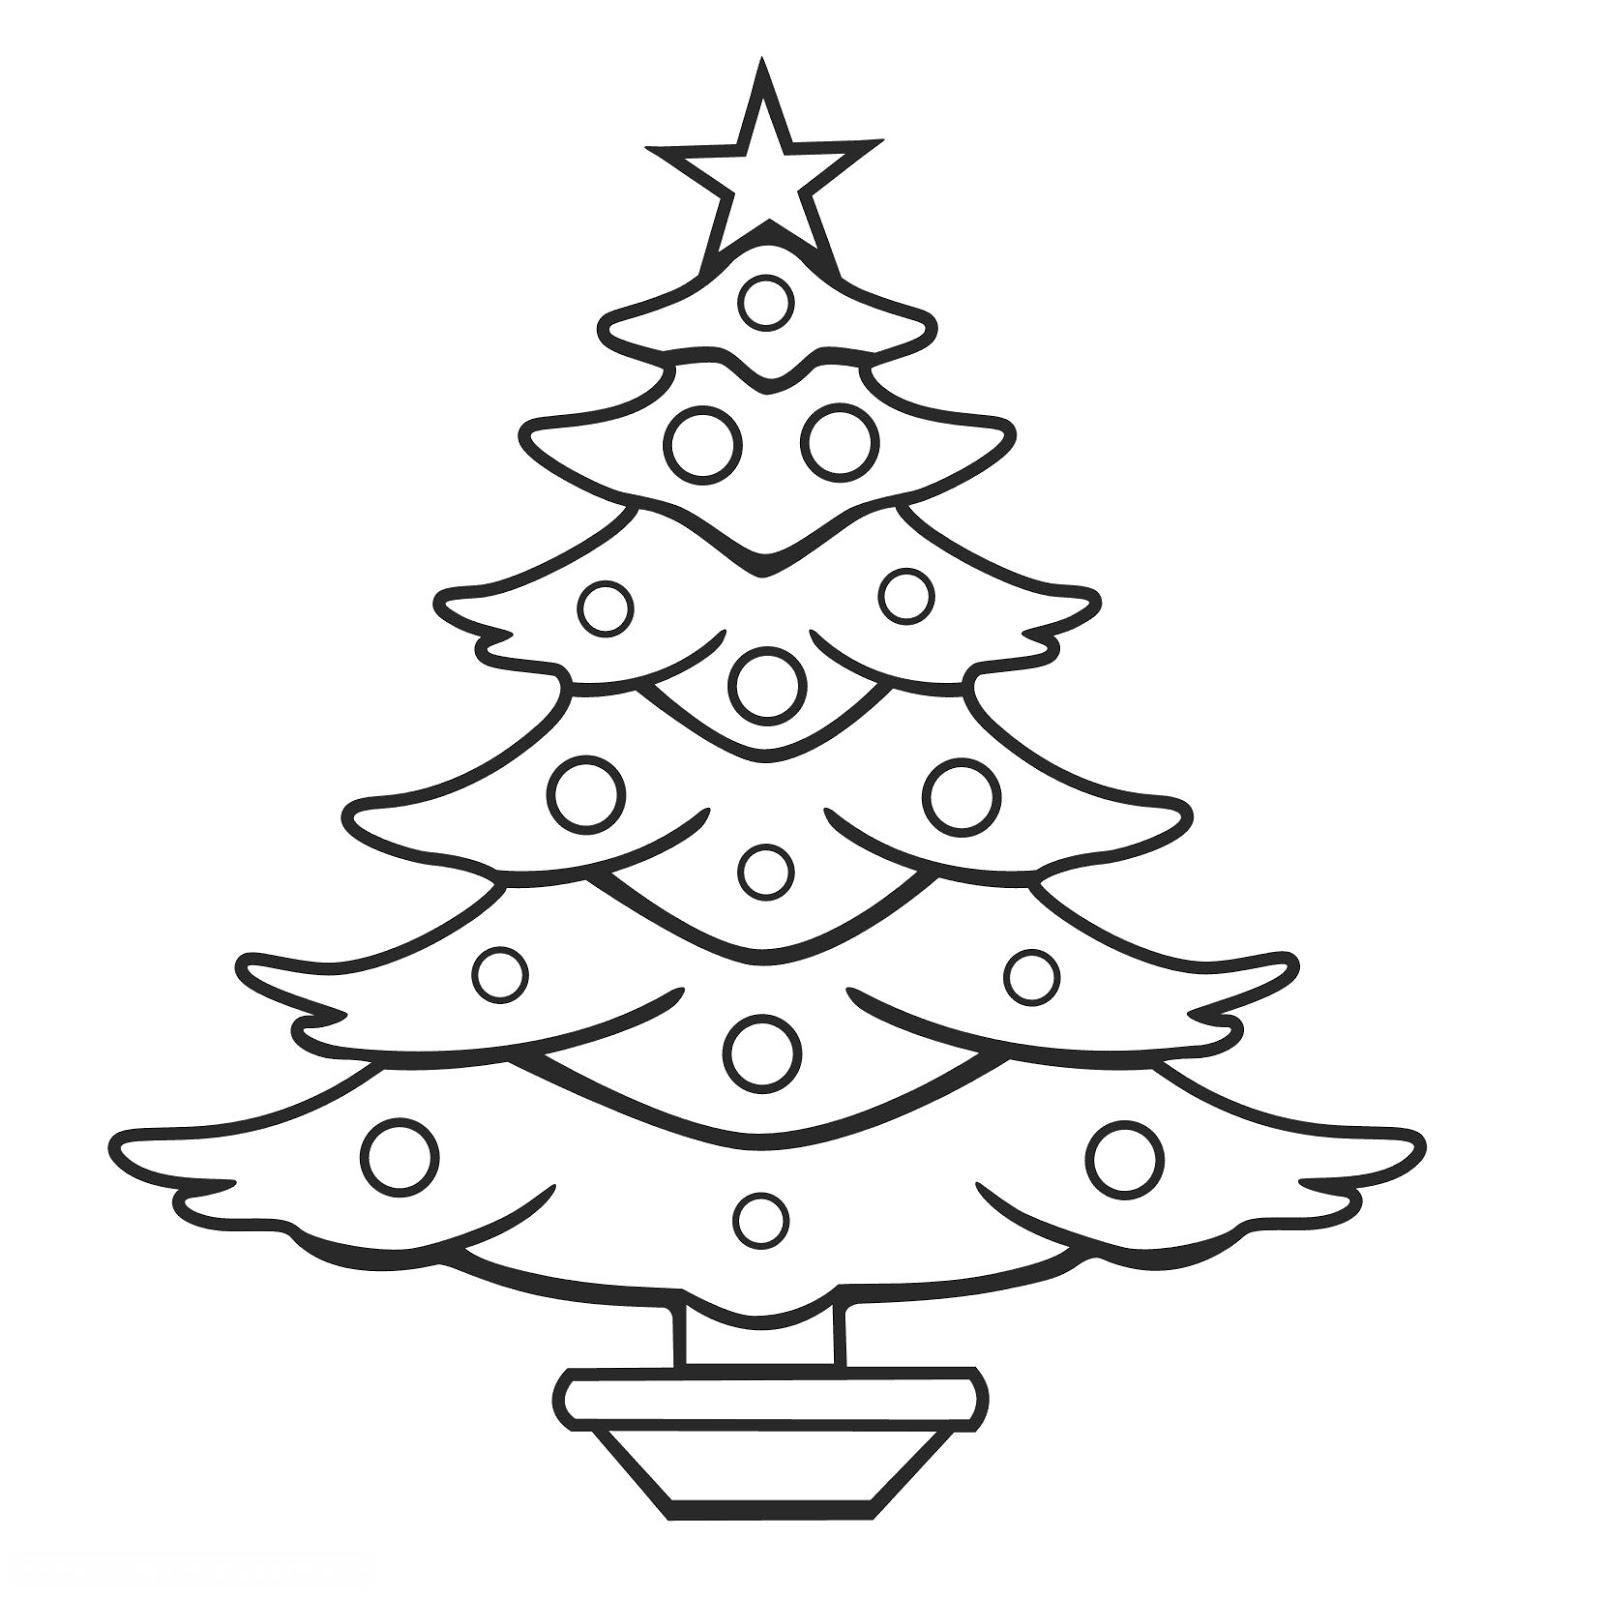 Árvore de Natal para imprimir e colorir